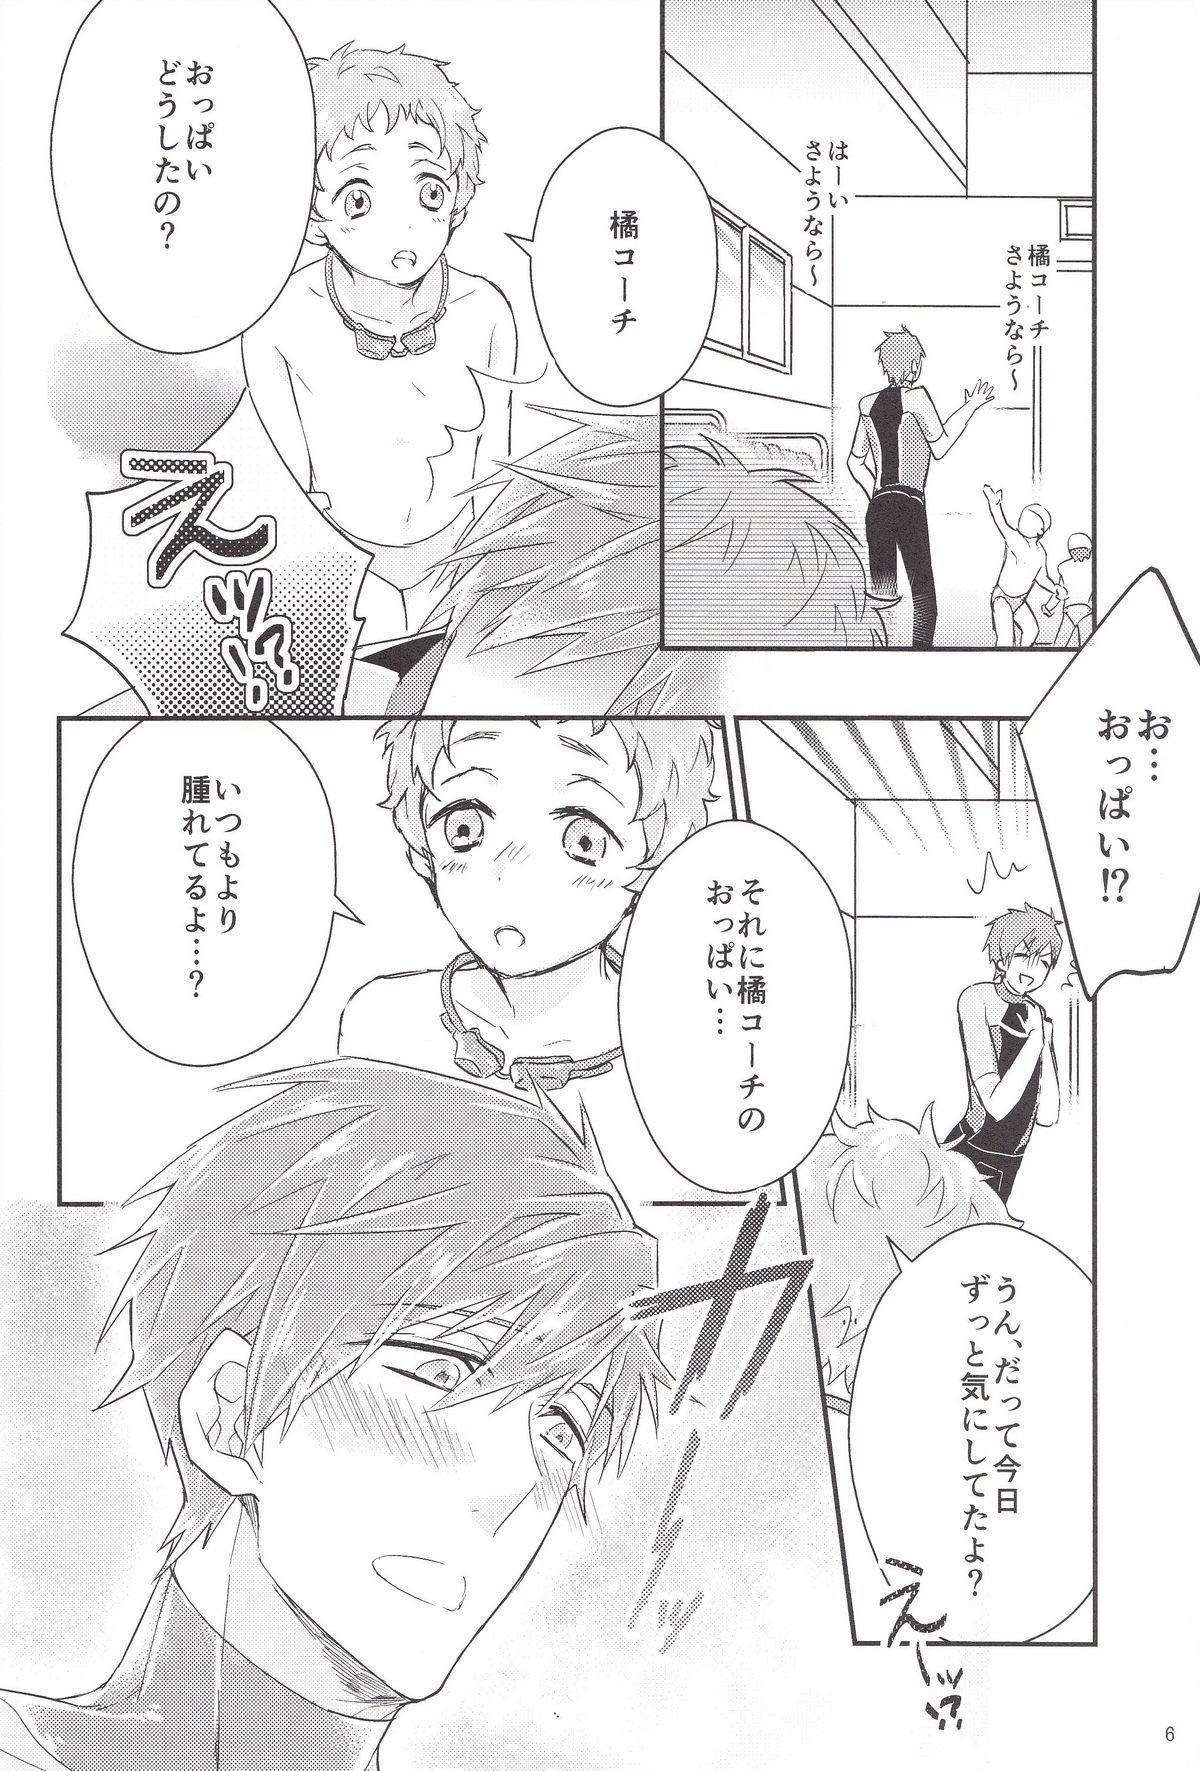 Tachibana Coach no Kojin Lesson 4